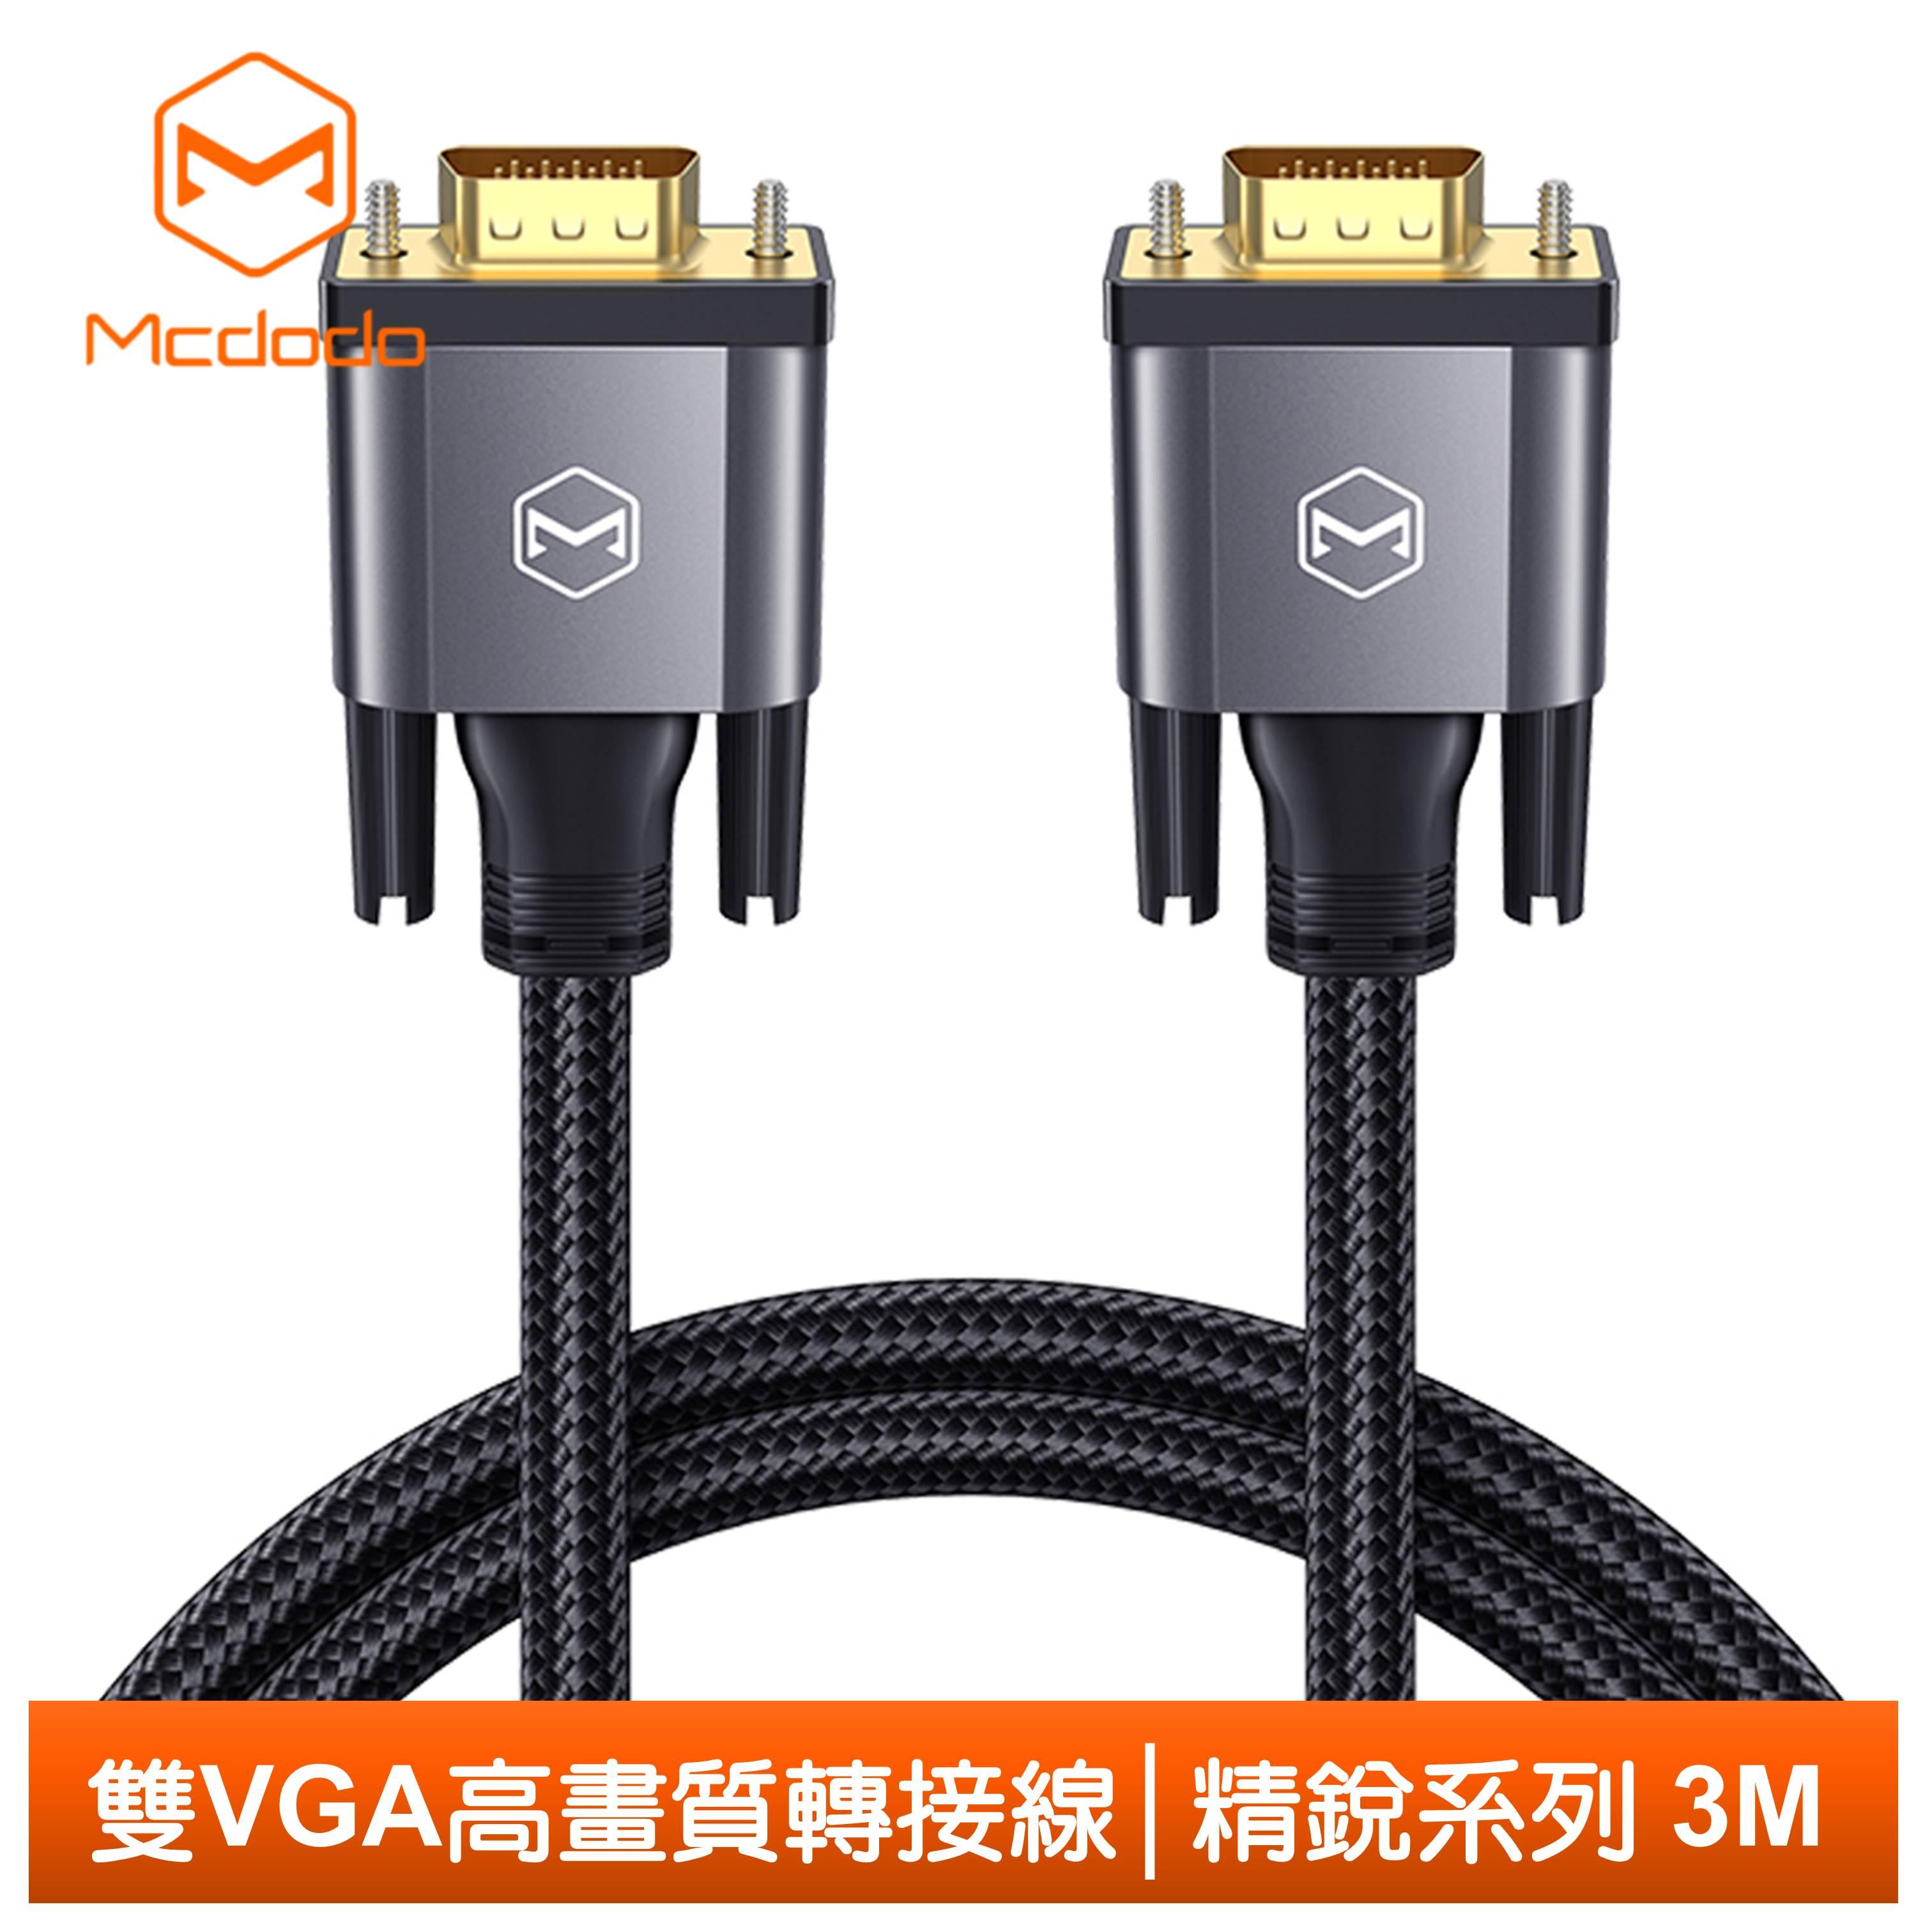 Mcdodo麥多多台灣官方 高清 VGA 轉 VGA 轉接線 轉接器 公對公 精銳系列 3M